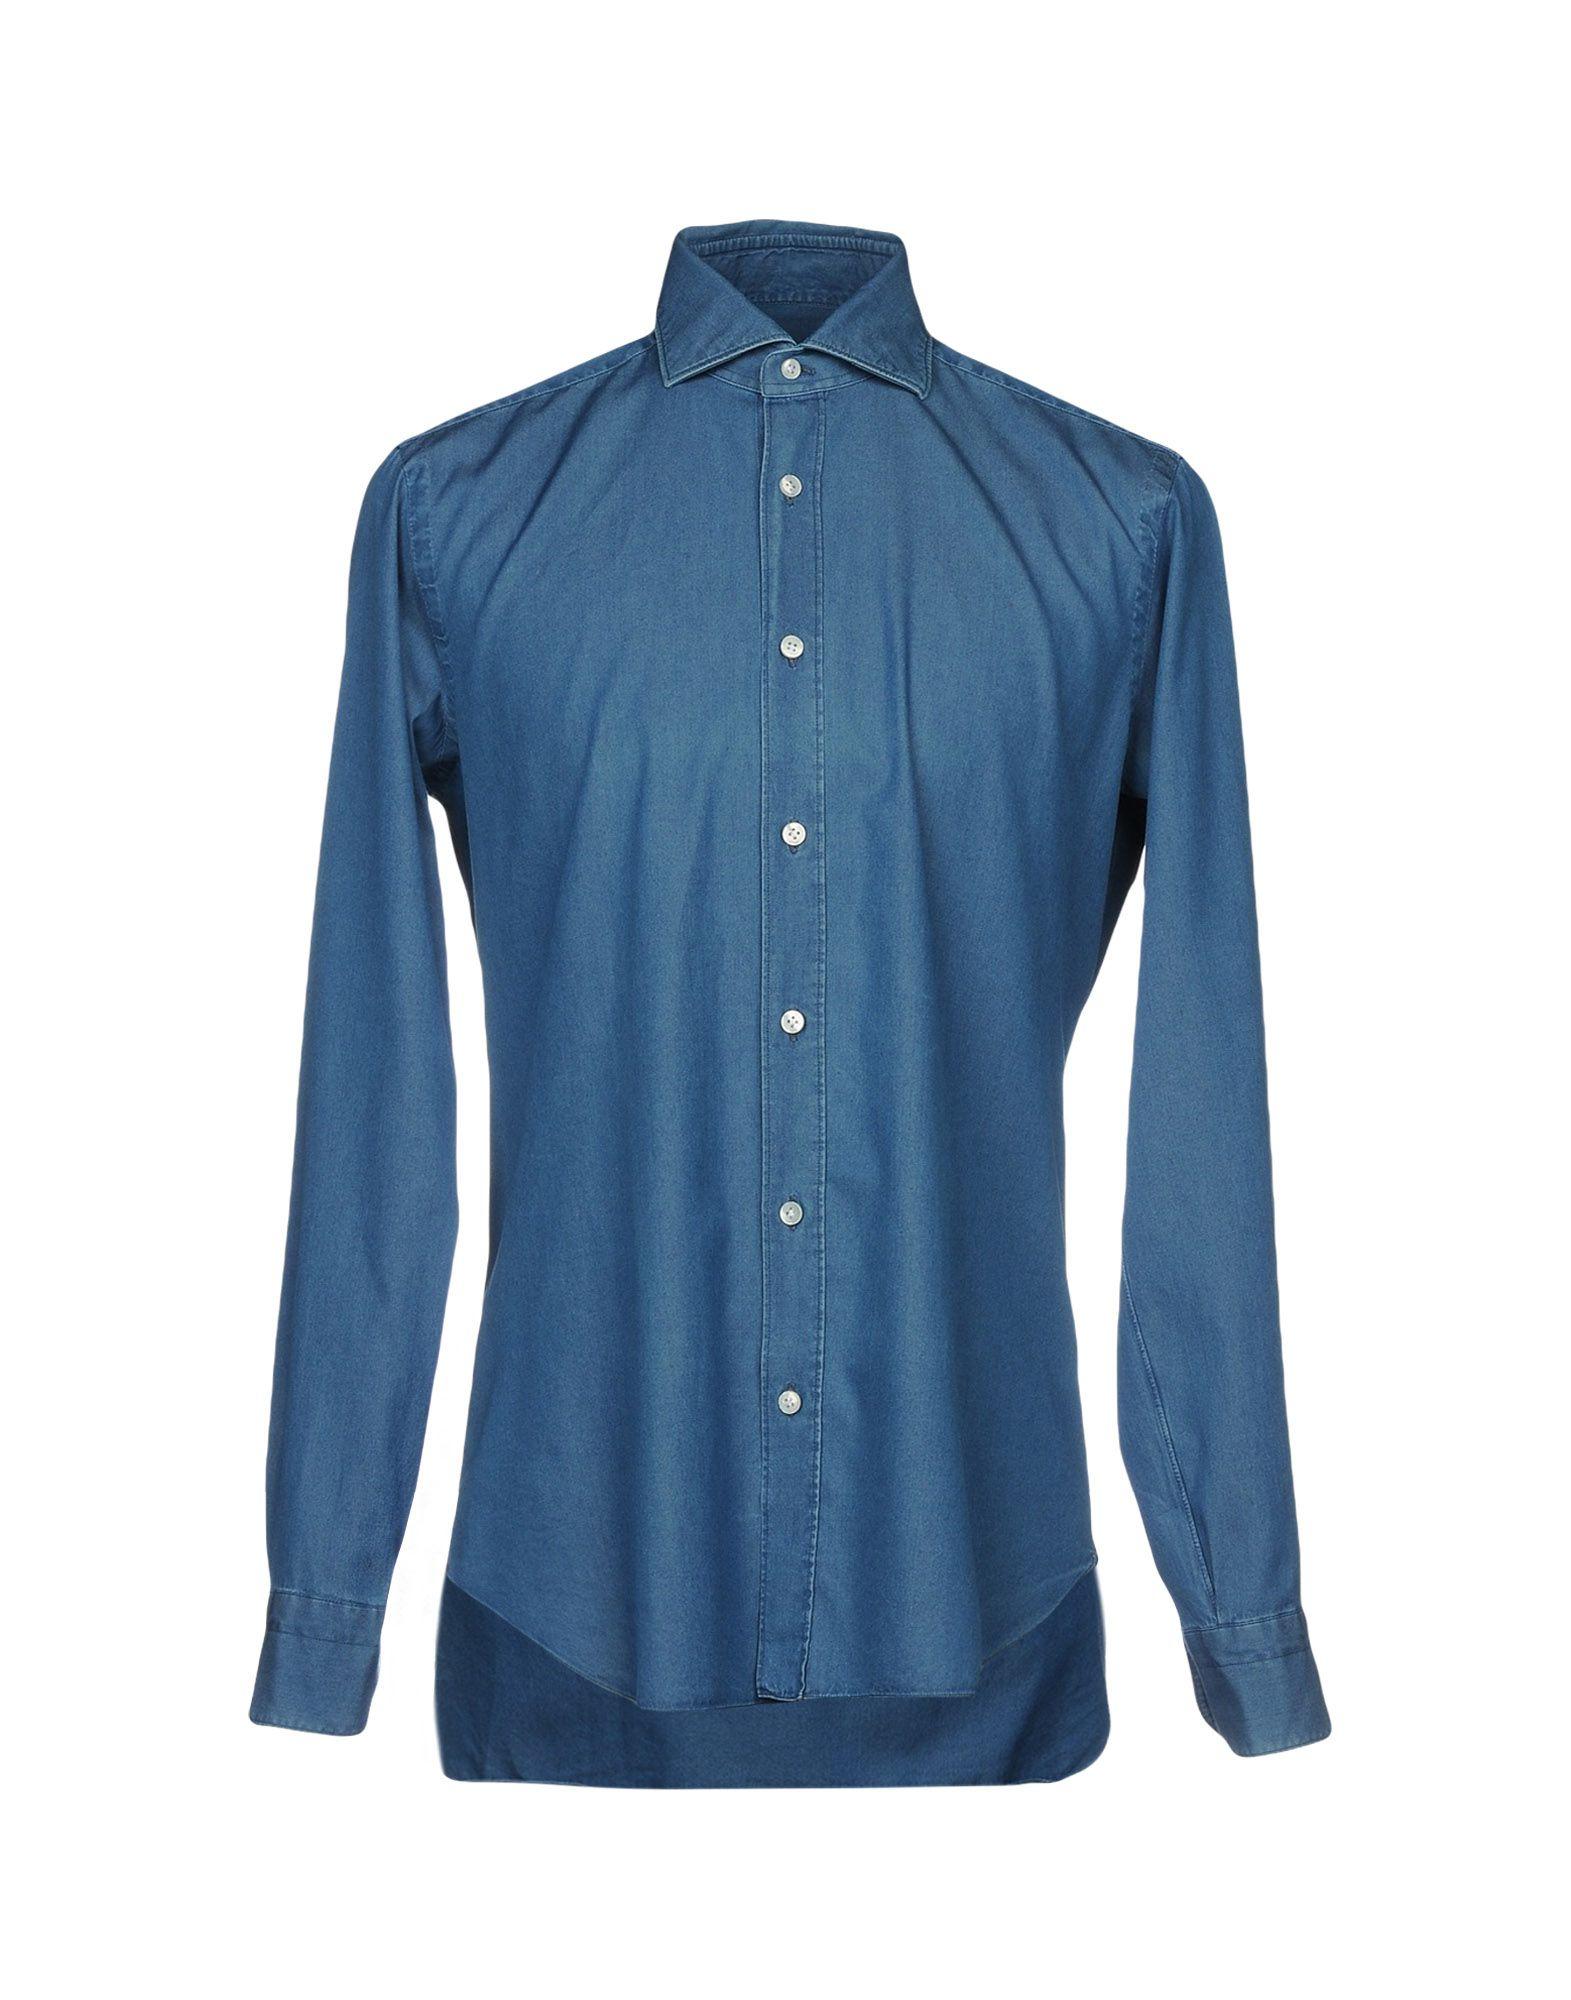 BARBA Napoli Джинсовая рубашка цена 2017